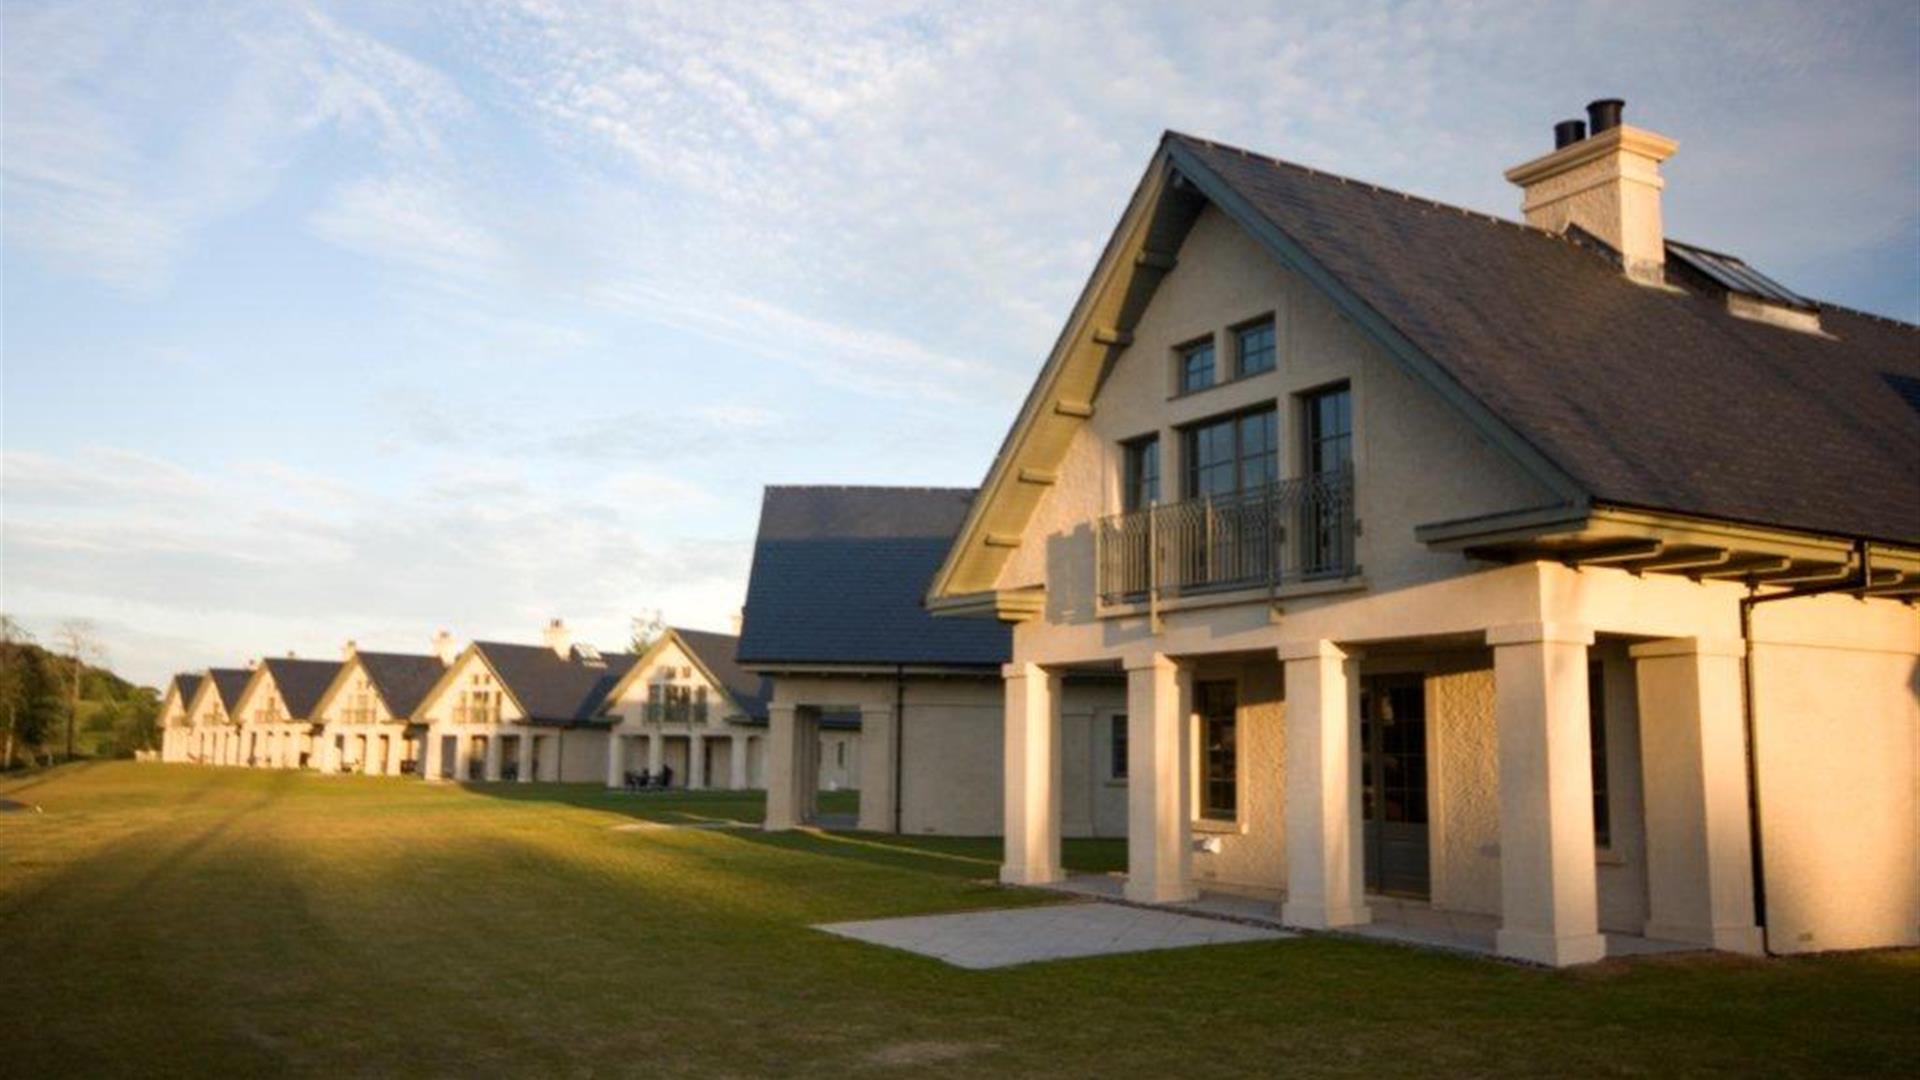 Lodge at Lough Erne - No 26